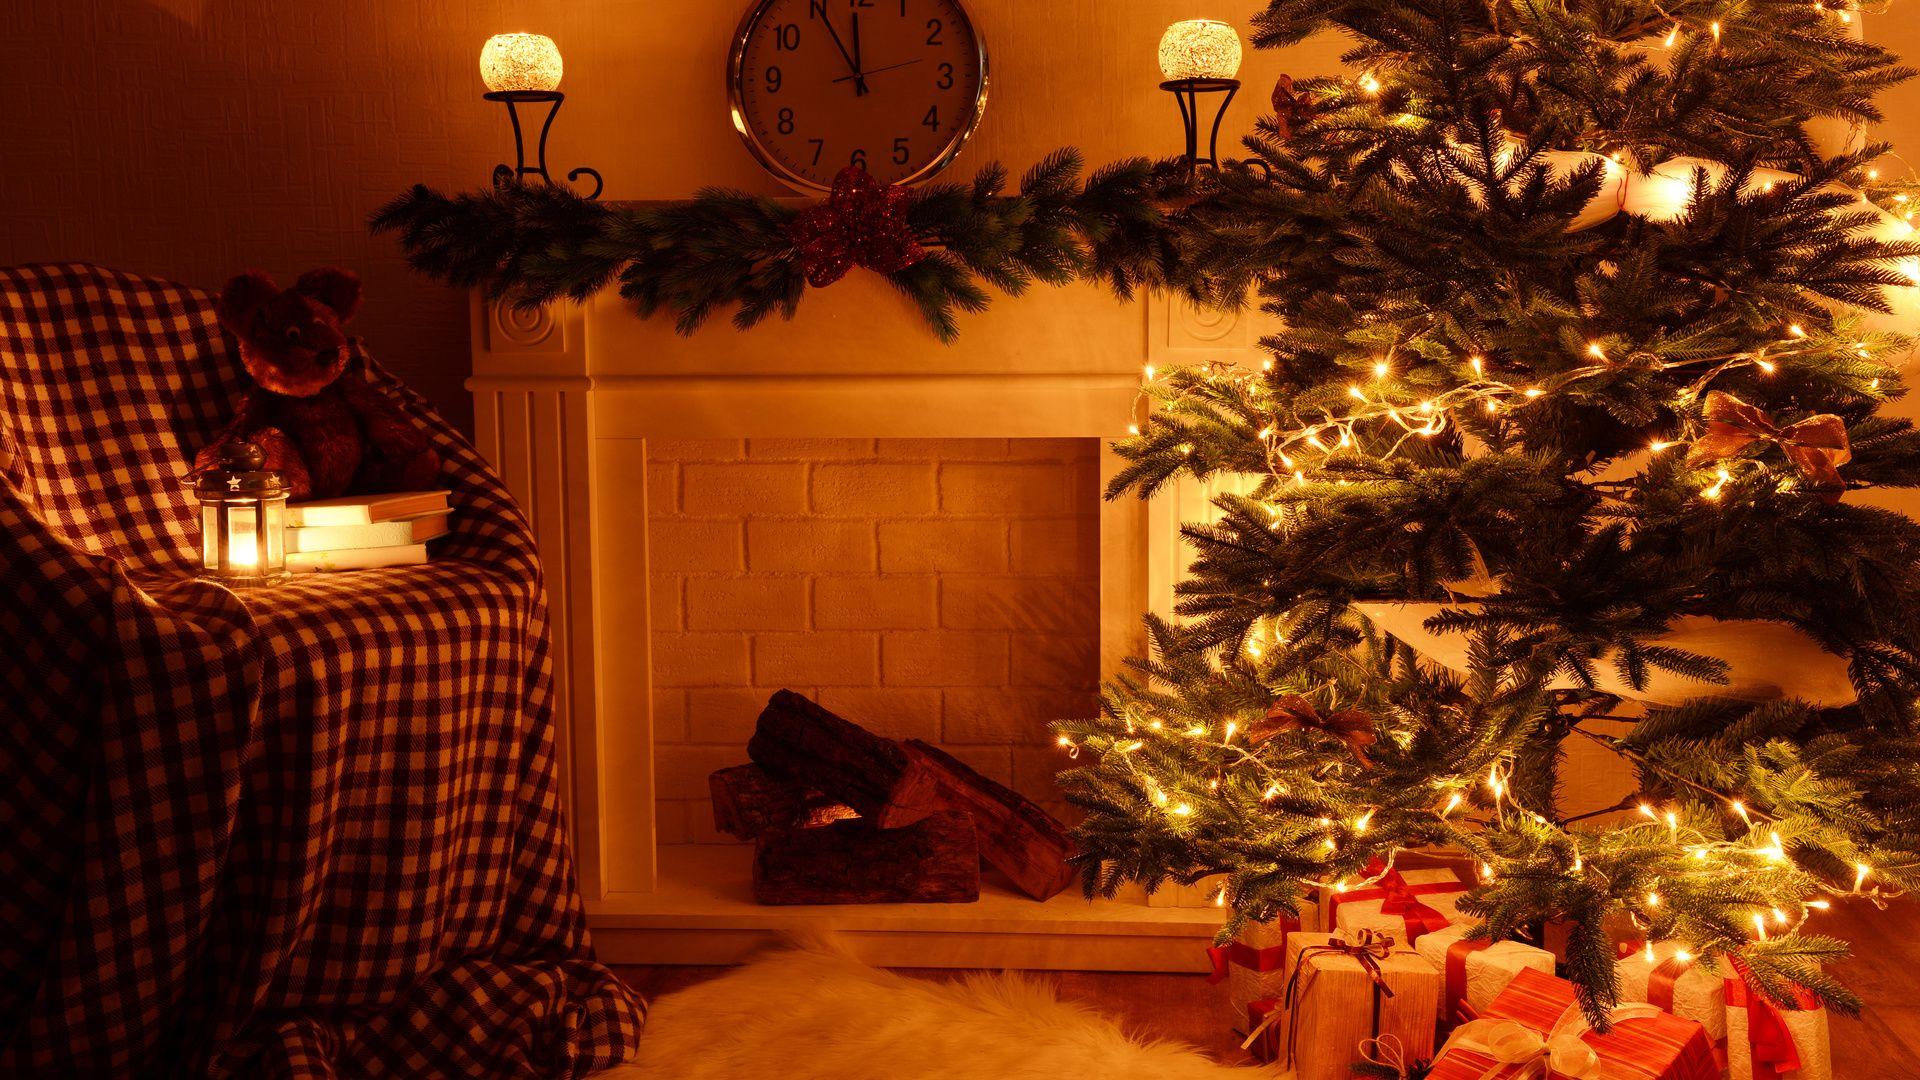 Christmas Fireplace Comfort desktop wallpaper download